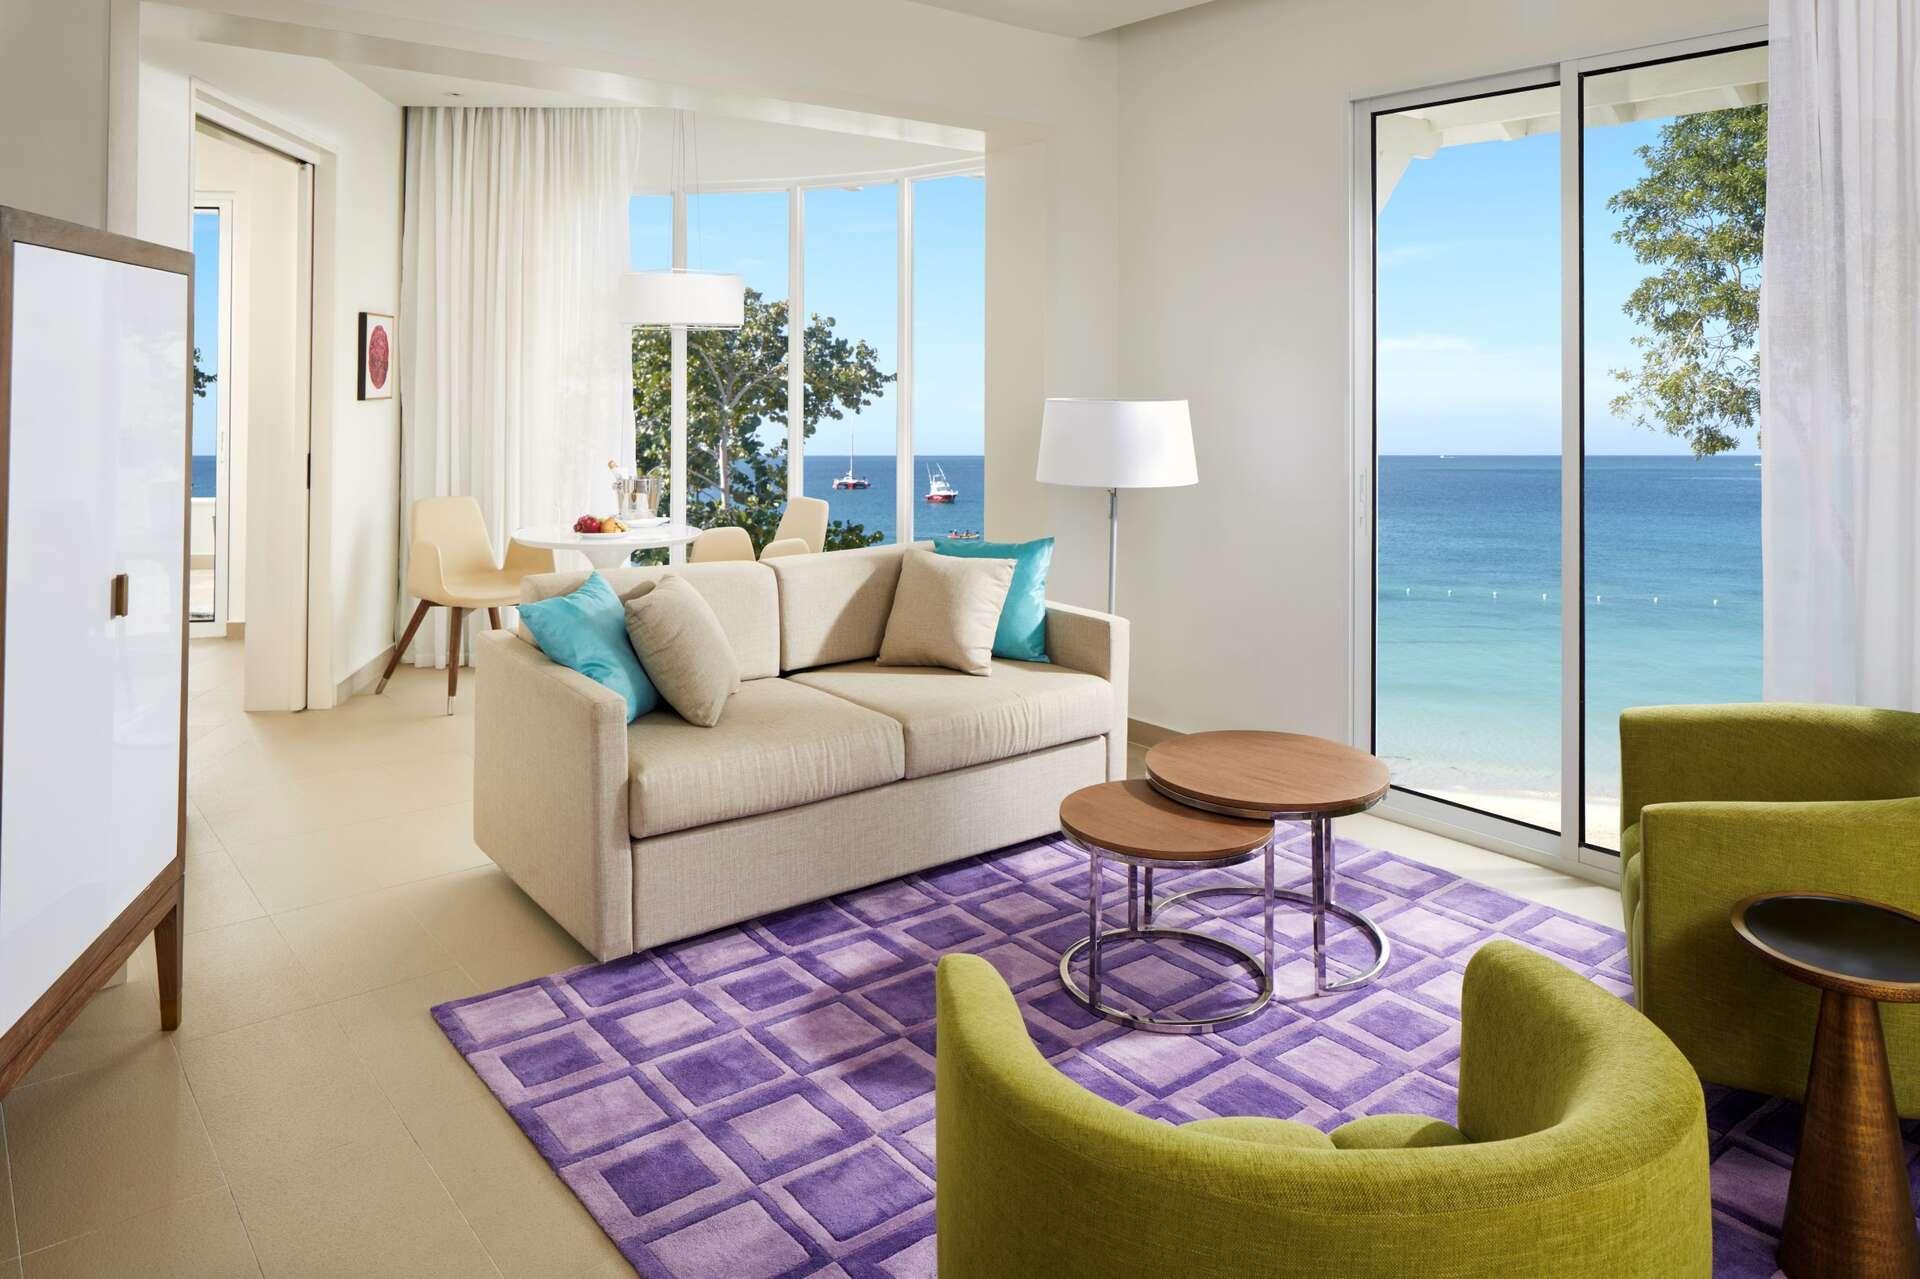 Luxury villa rentals caribbean - Jamaica - Negril - Azul beach resort negril - Presidential Swim-Up Studio - Image 1/13